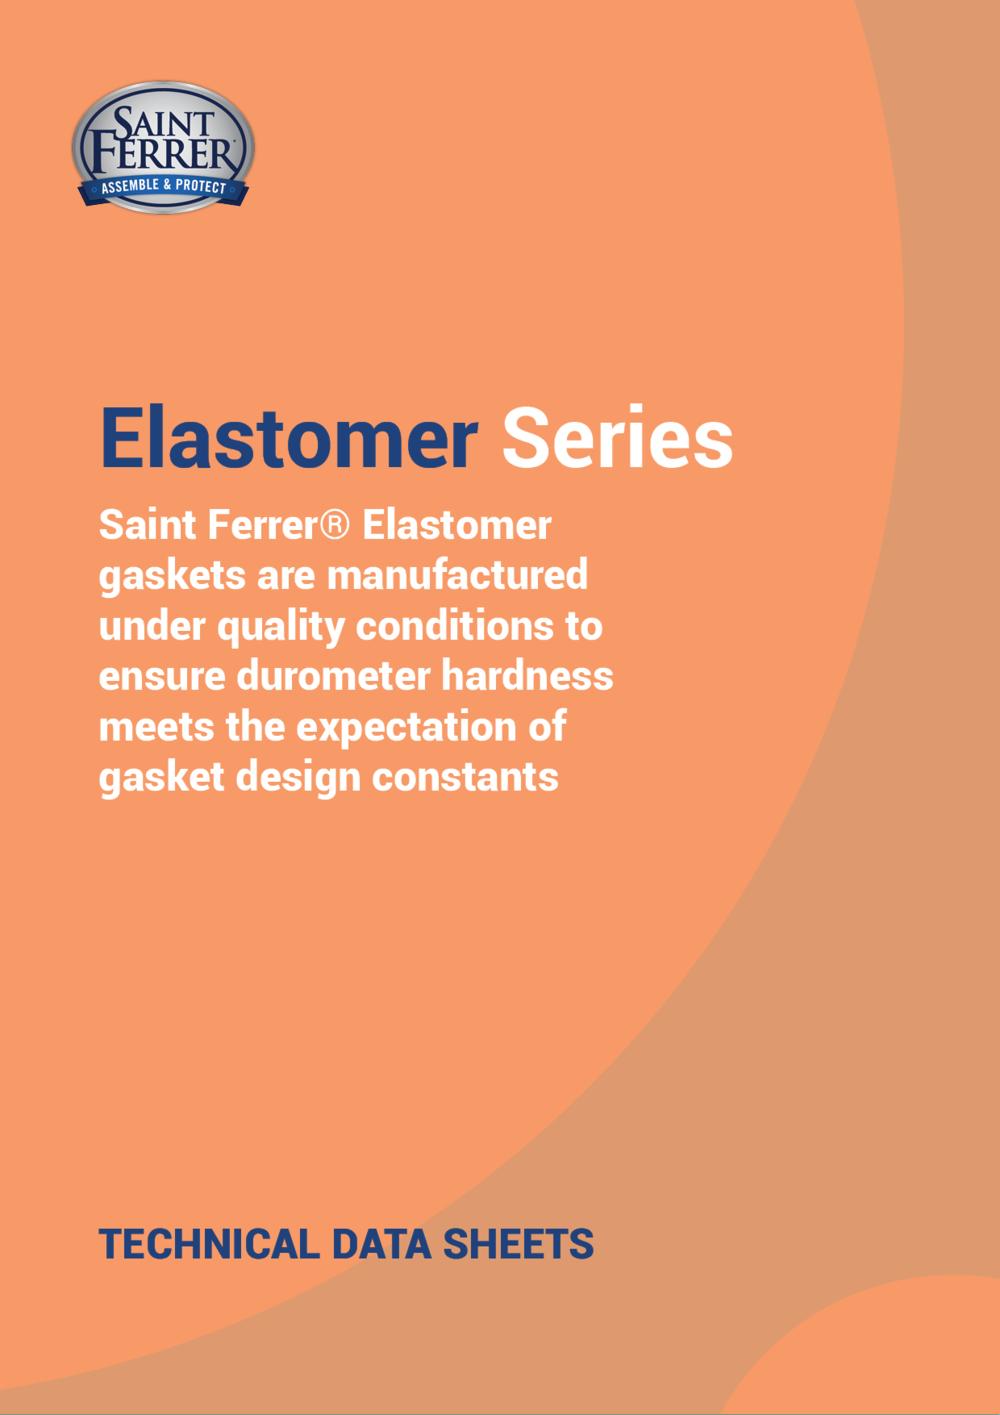 Elastomer Series.png